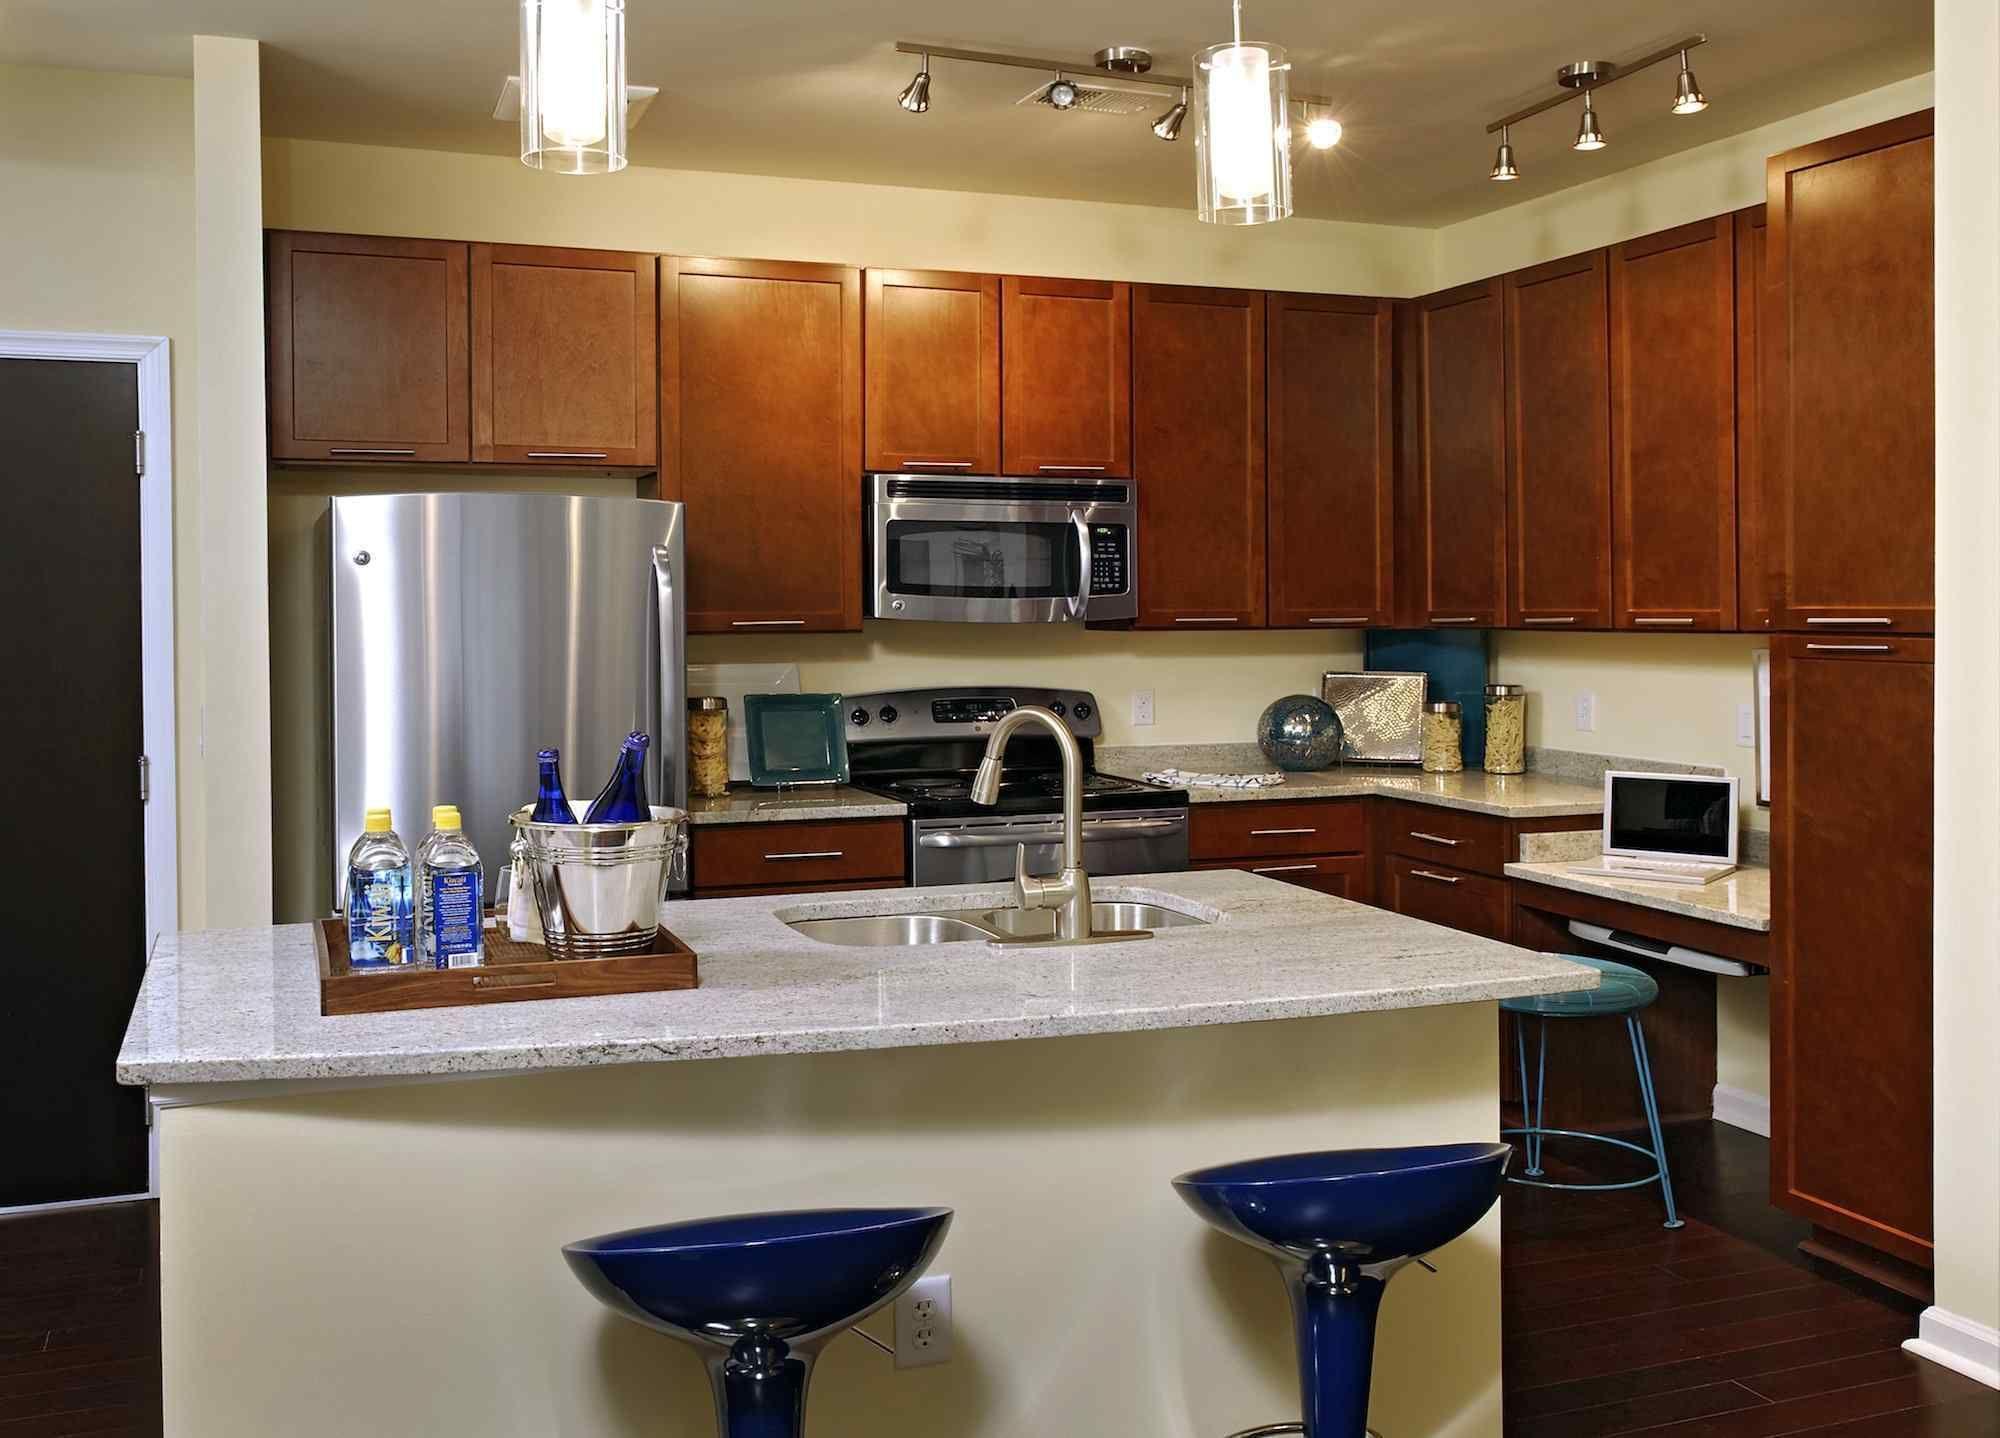 Kitchen island with Stove Layout Sinks - Elegant Kitchen island with Stove Layout Sinks, Fancy ...